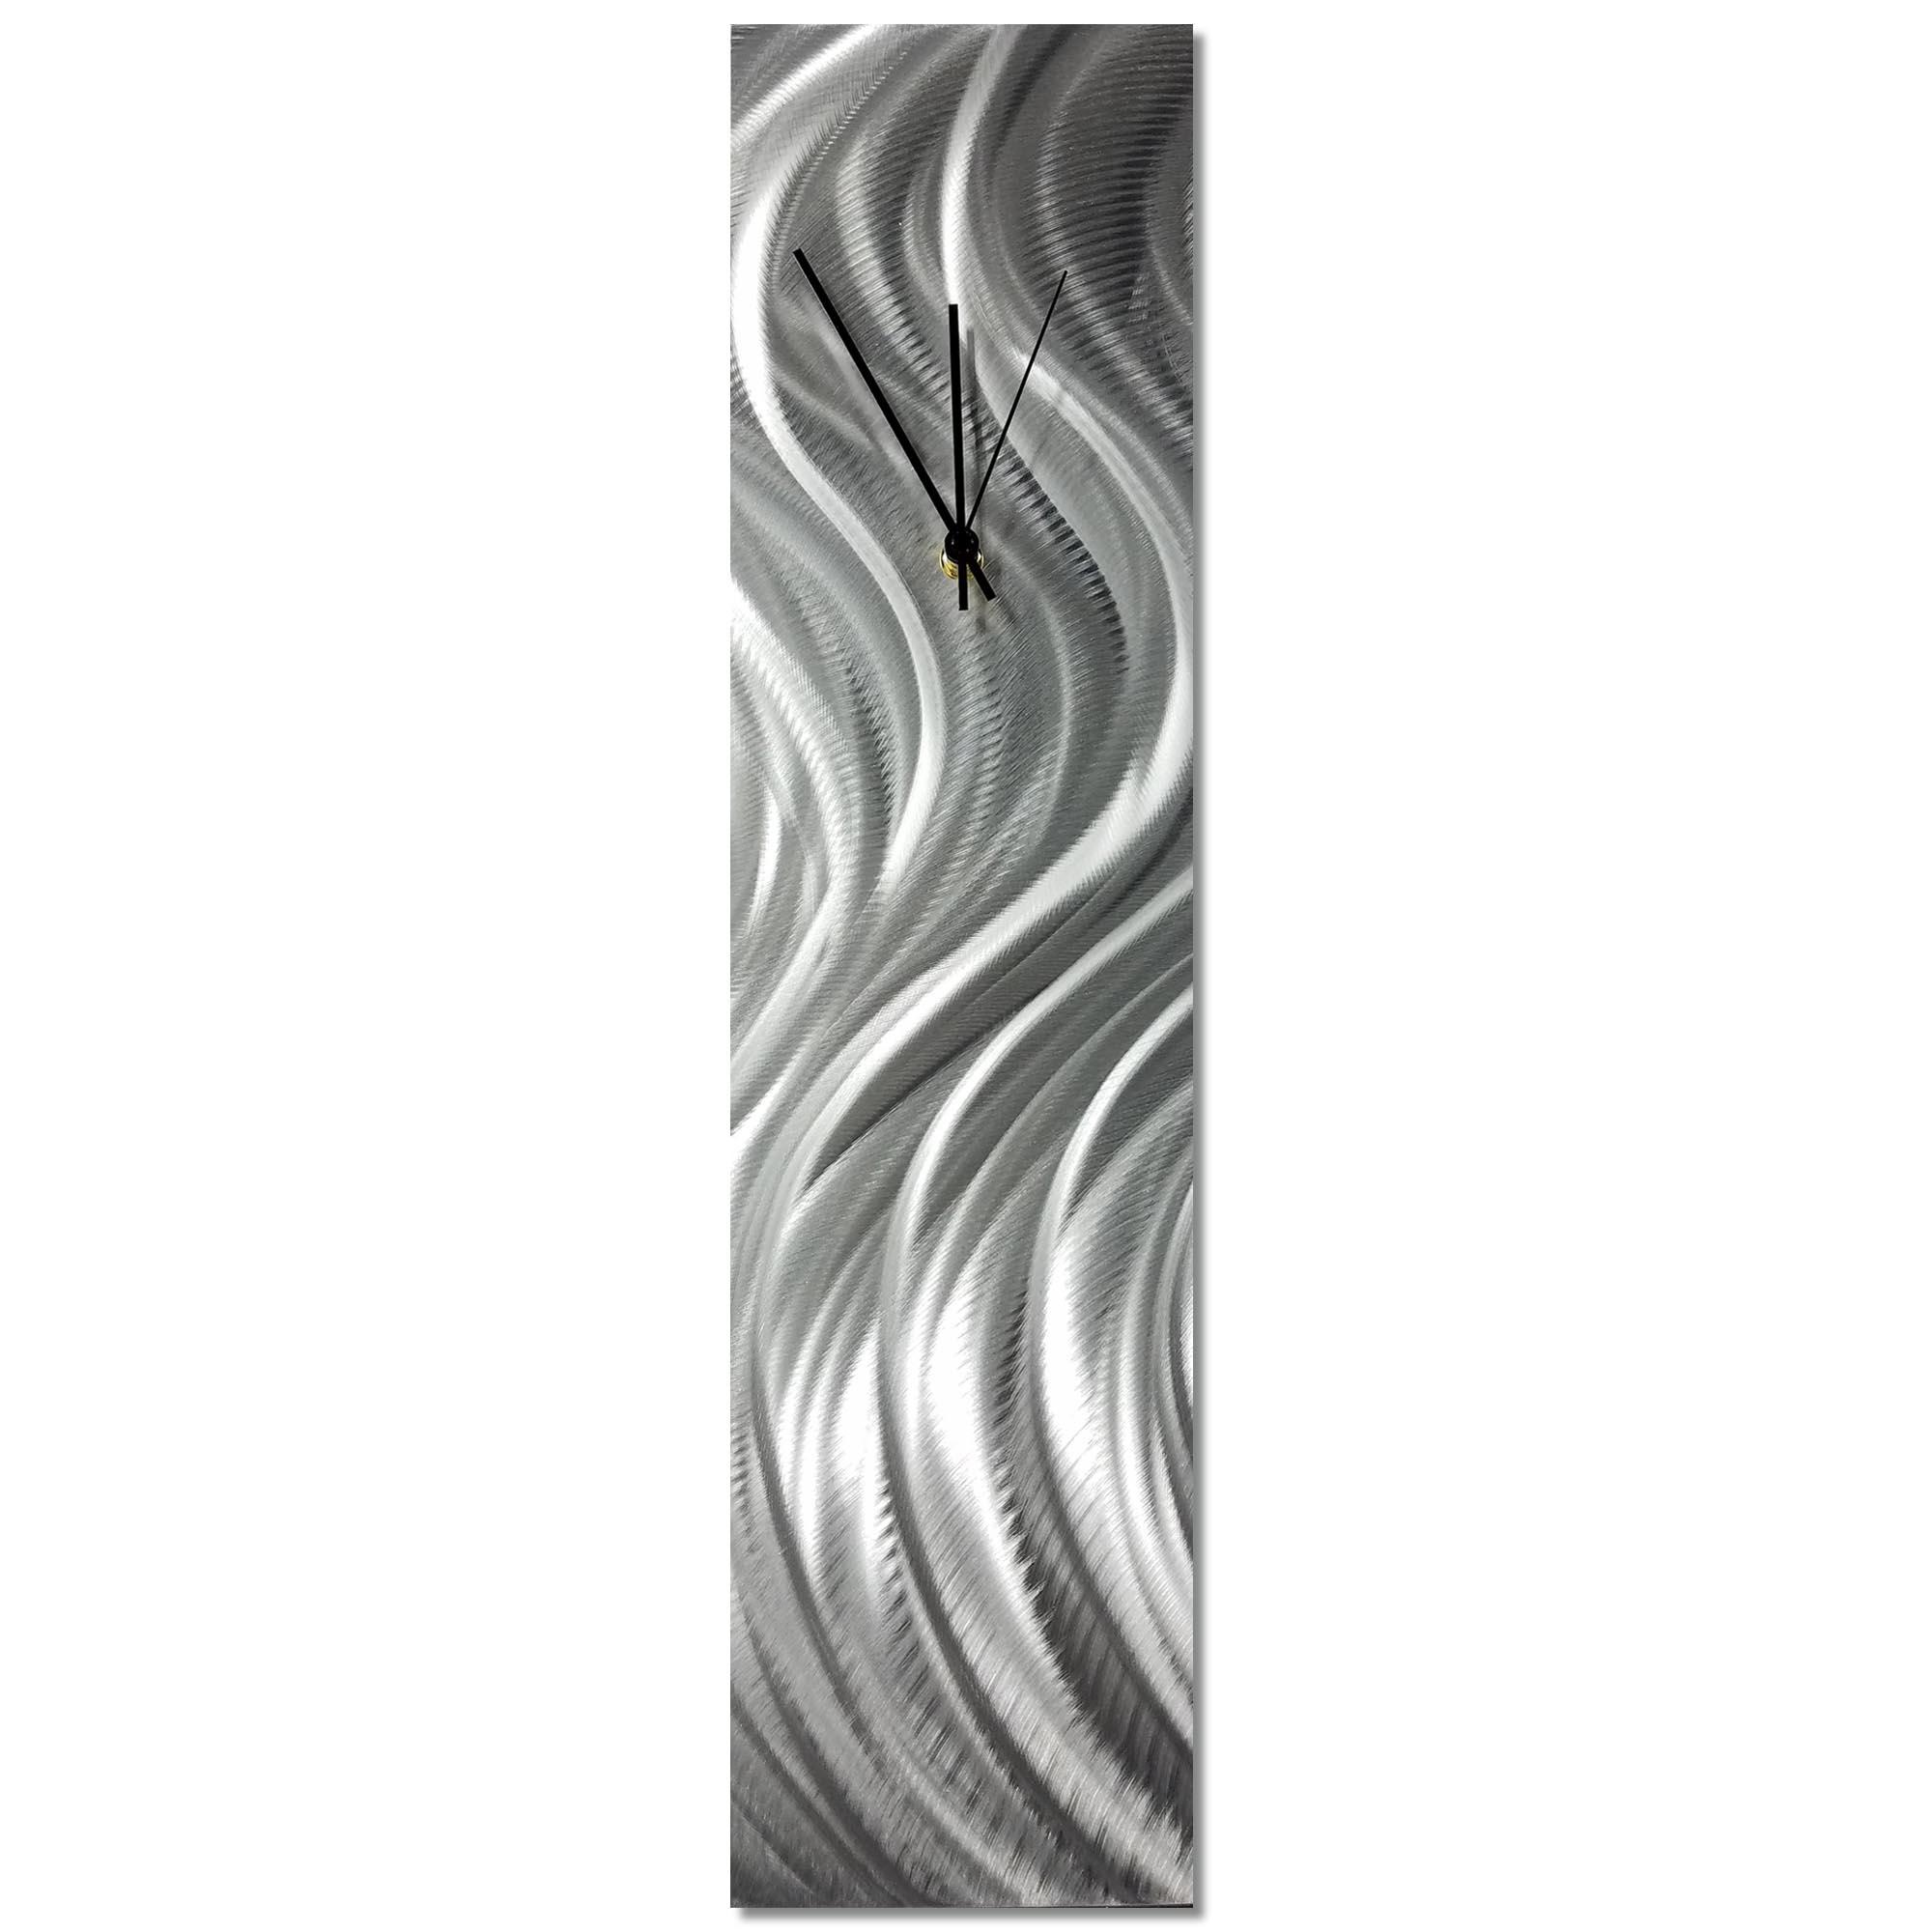 Silver River Clock 6x24in. Natural Aluminum